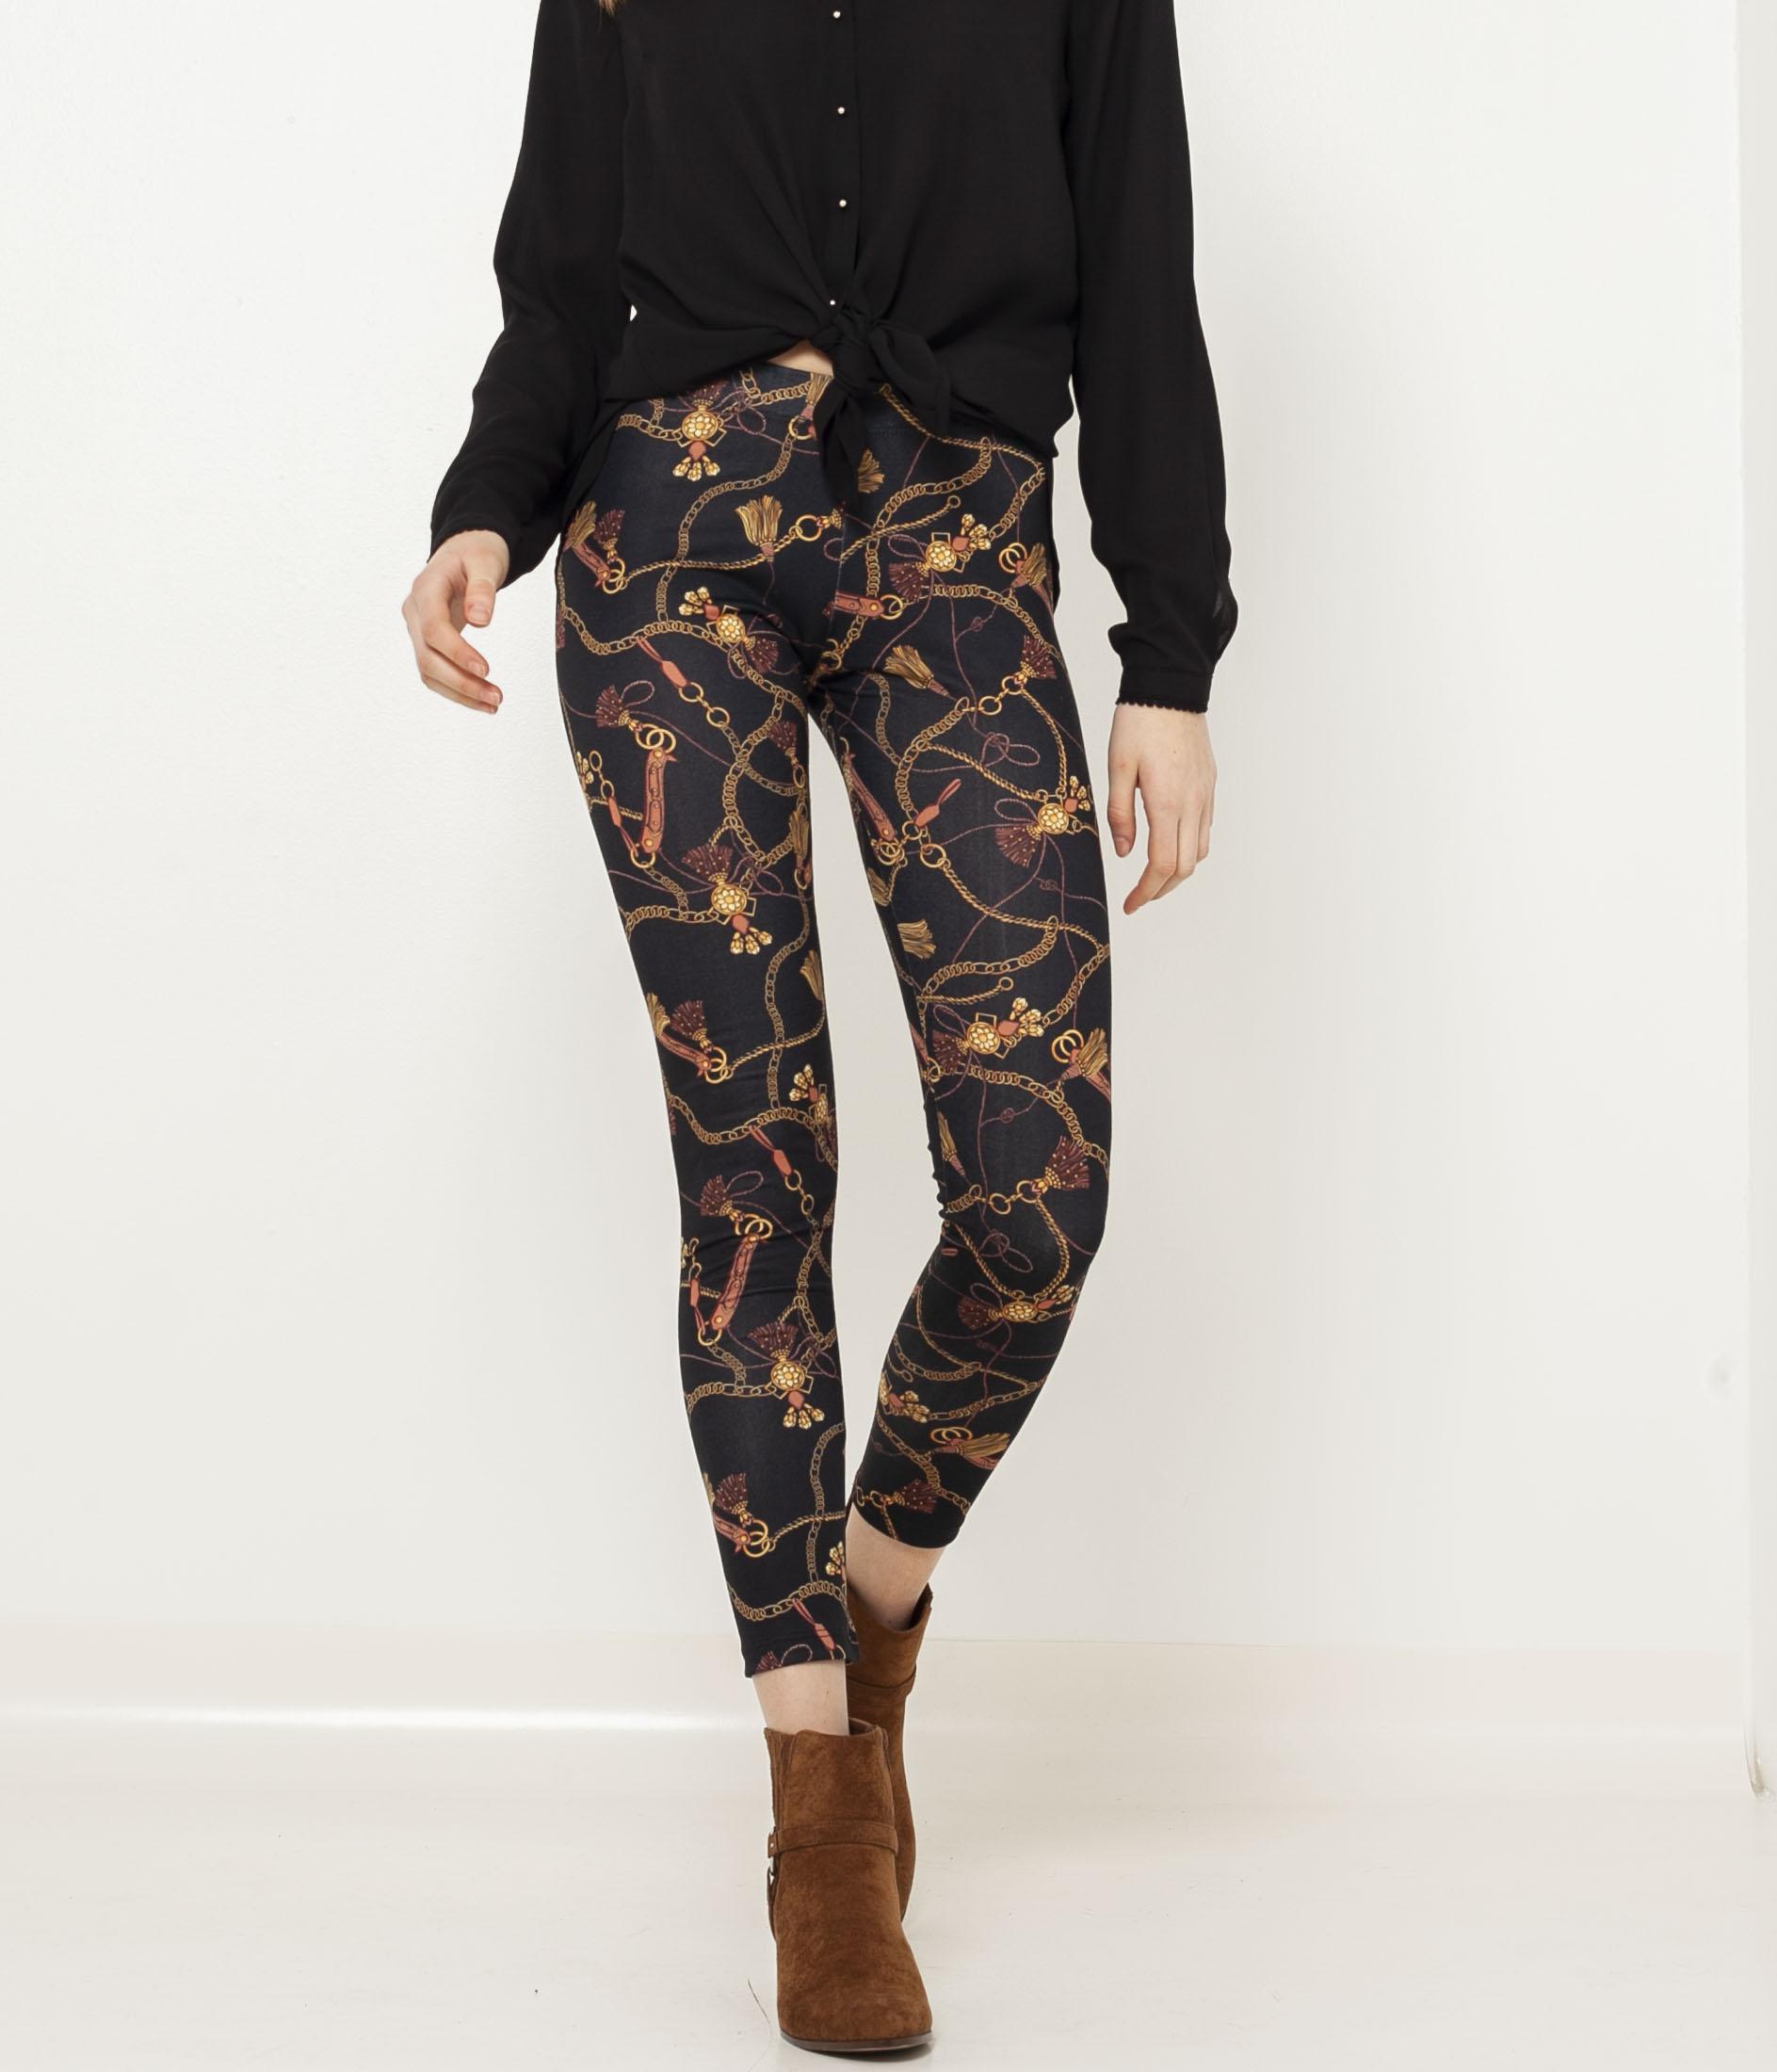 Femme Imprimé Imprimé Foulard Legging Legging Foulard Camaïeu Camaïeu WE2IeDH9Y